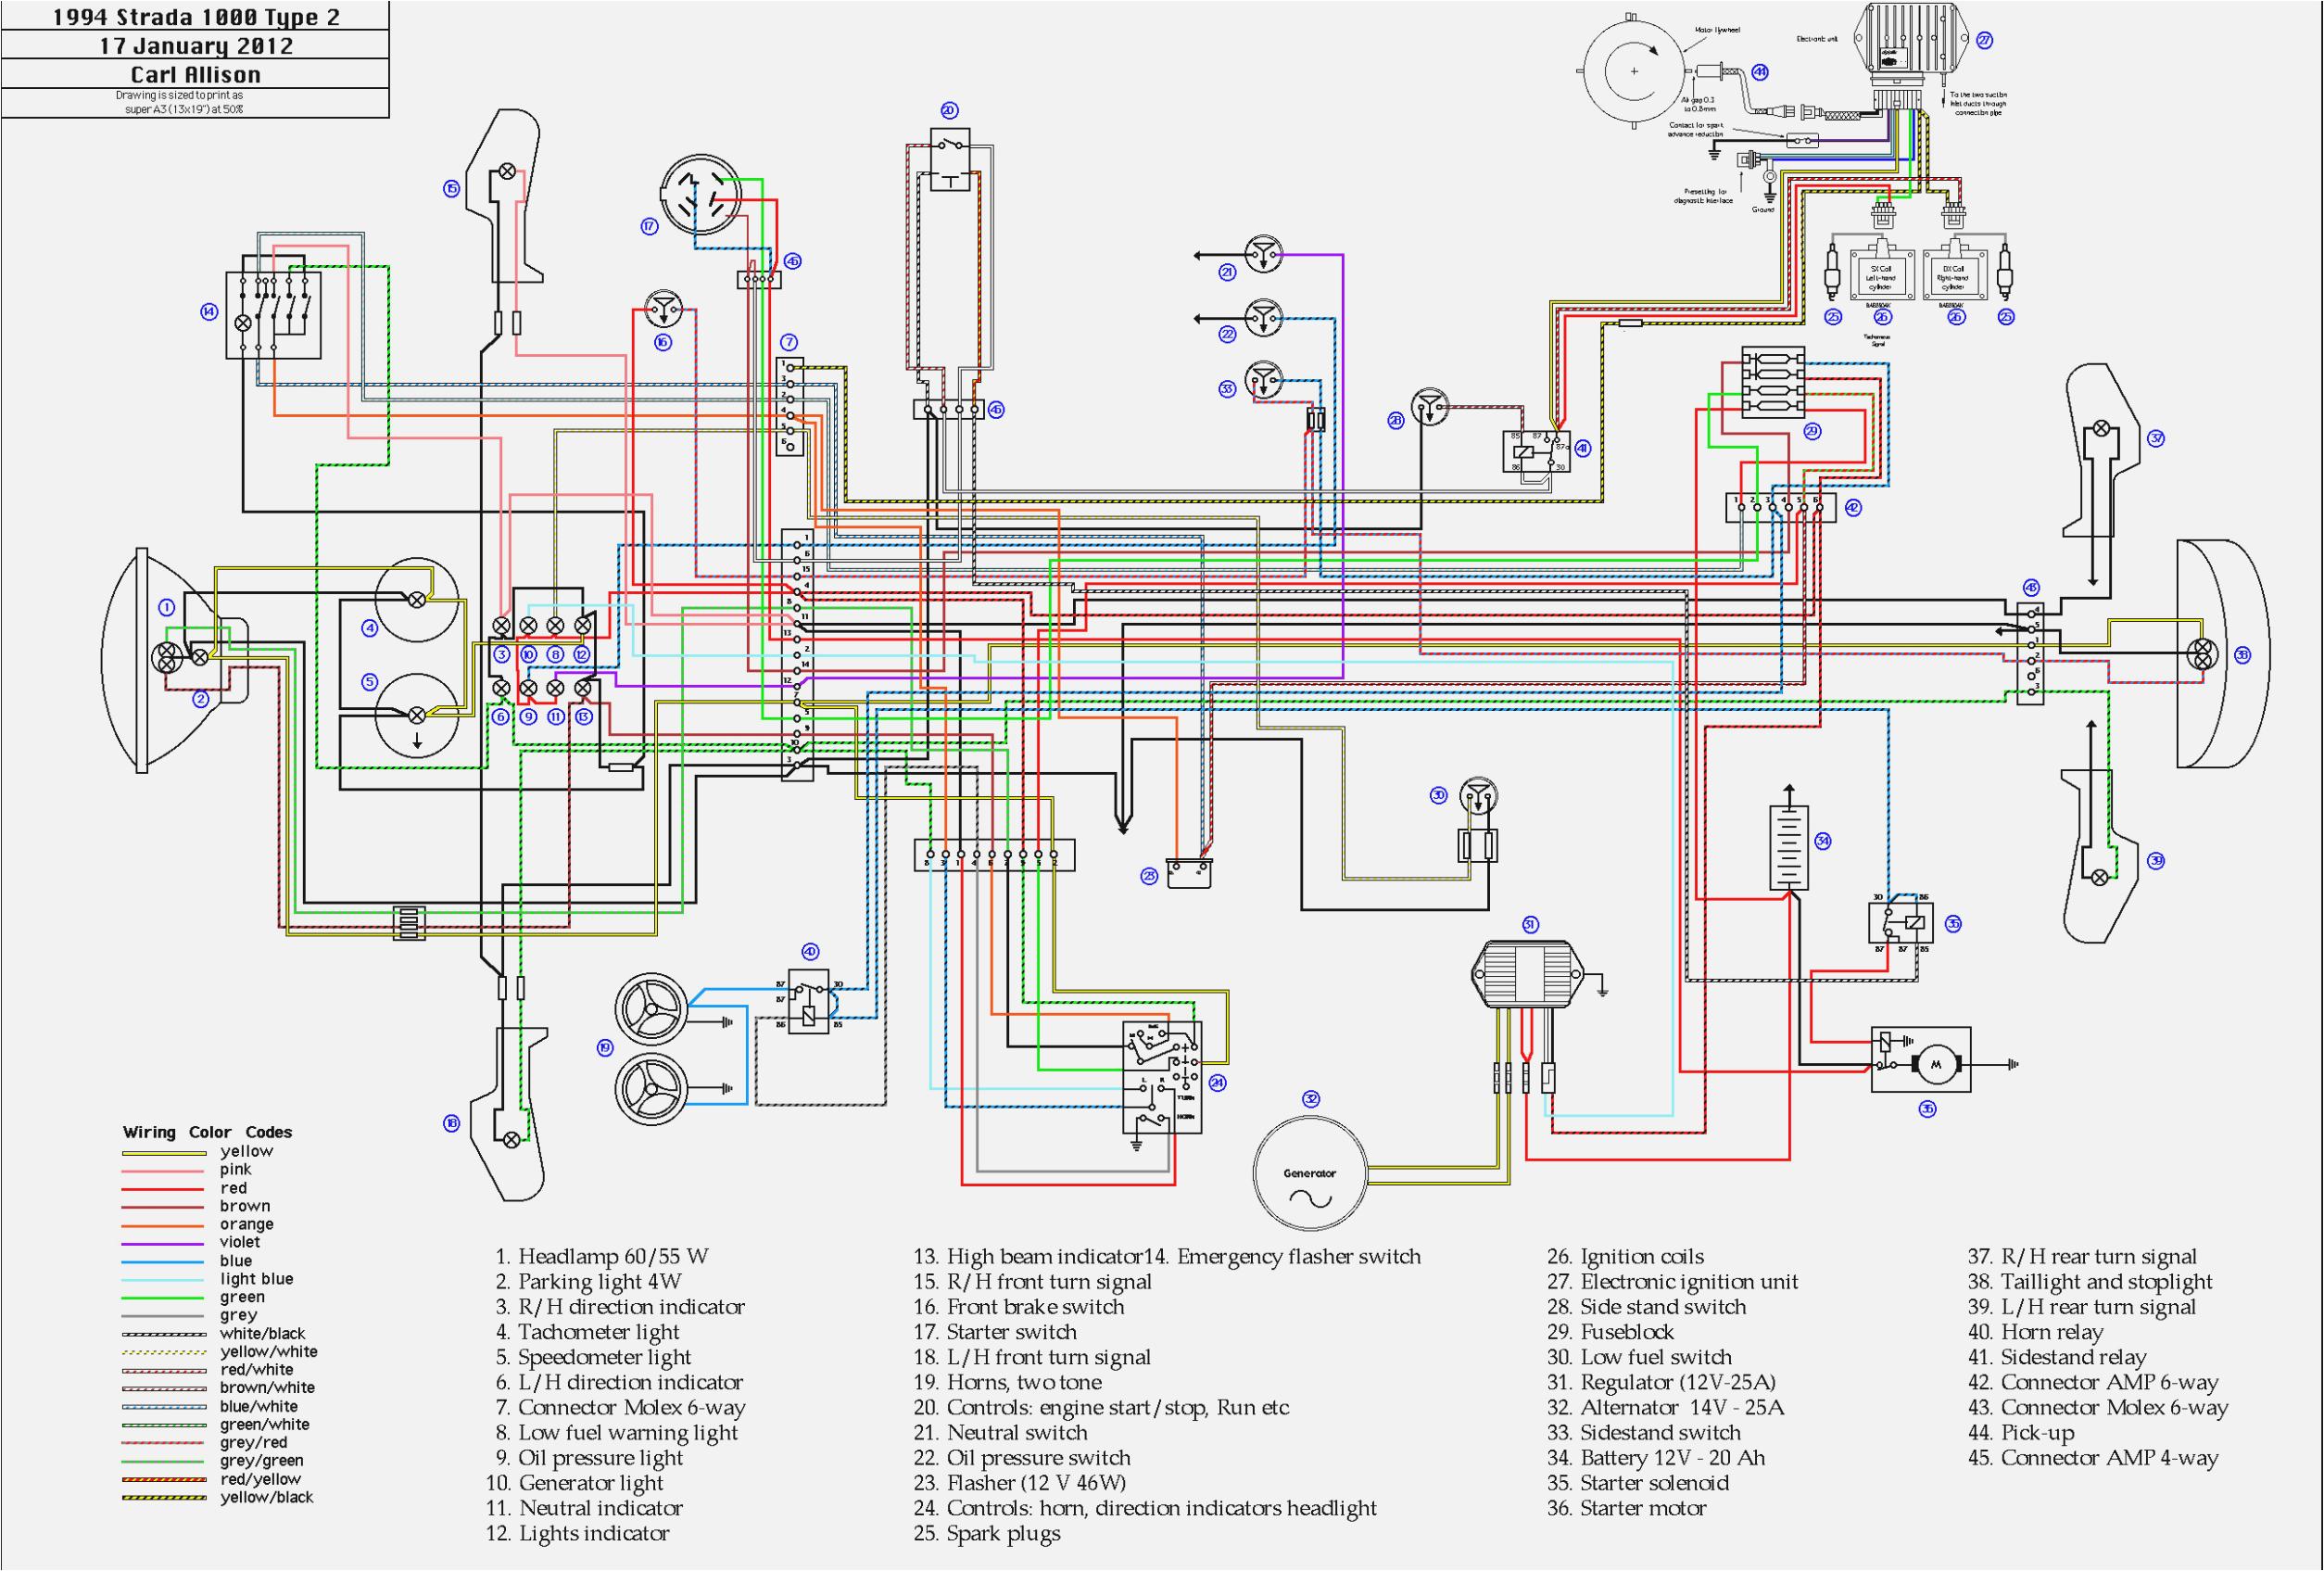 Omega Kustom Gauges Wiring Diagram How Omega Kustom Gauges Wiring Diagram Diagram Information